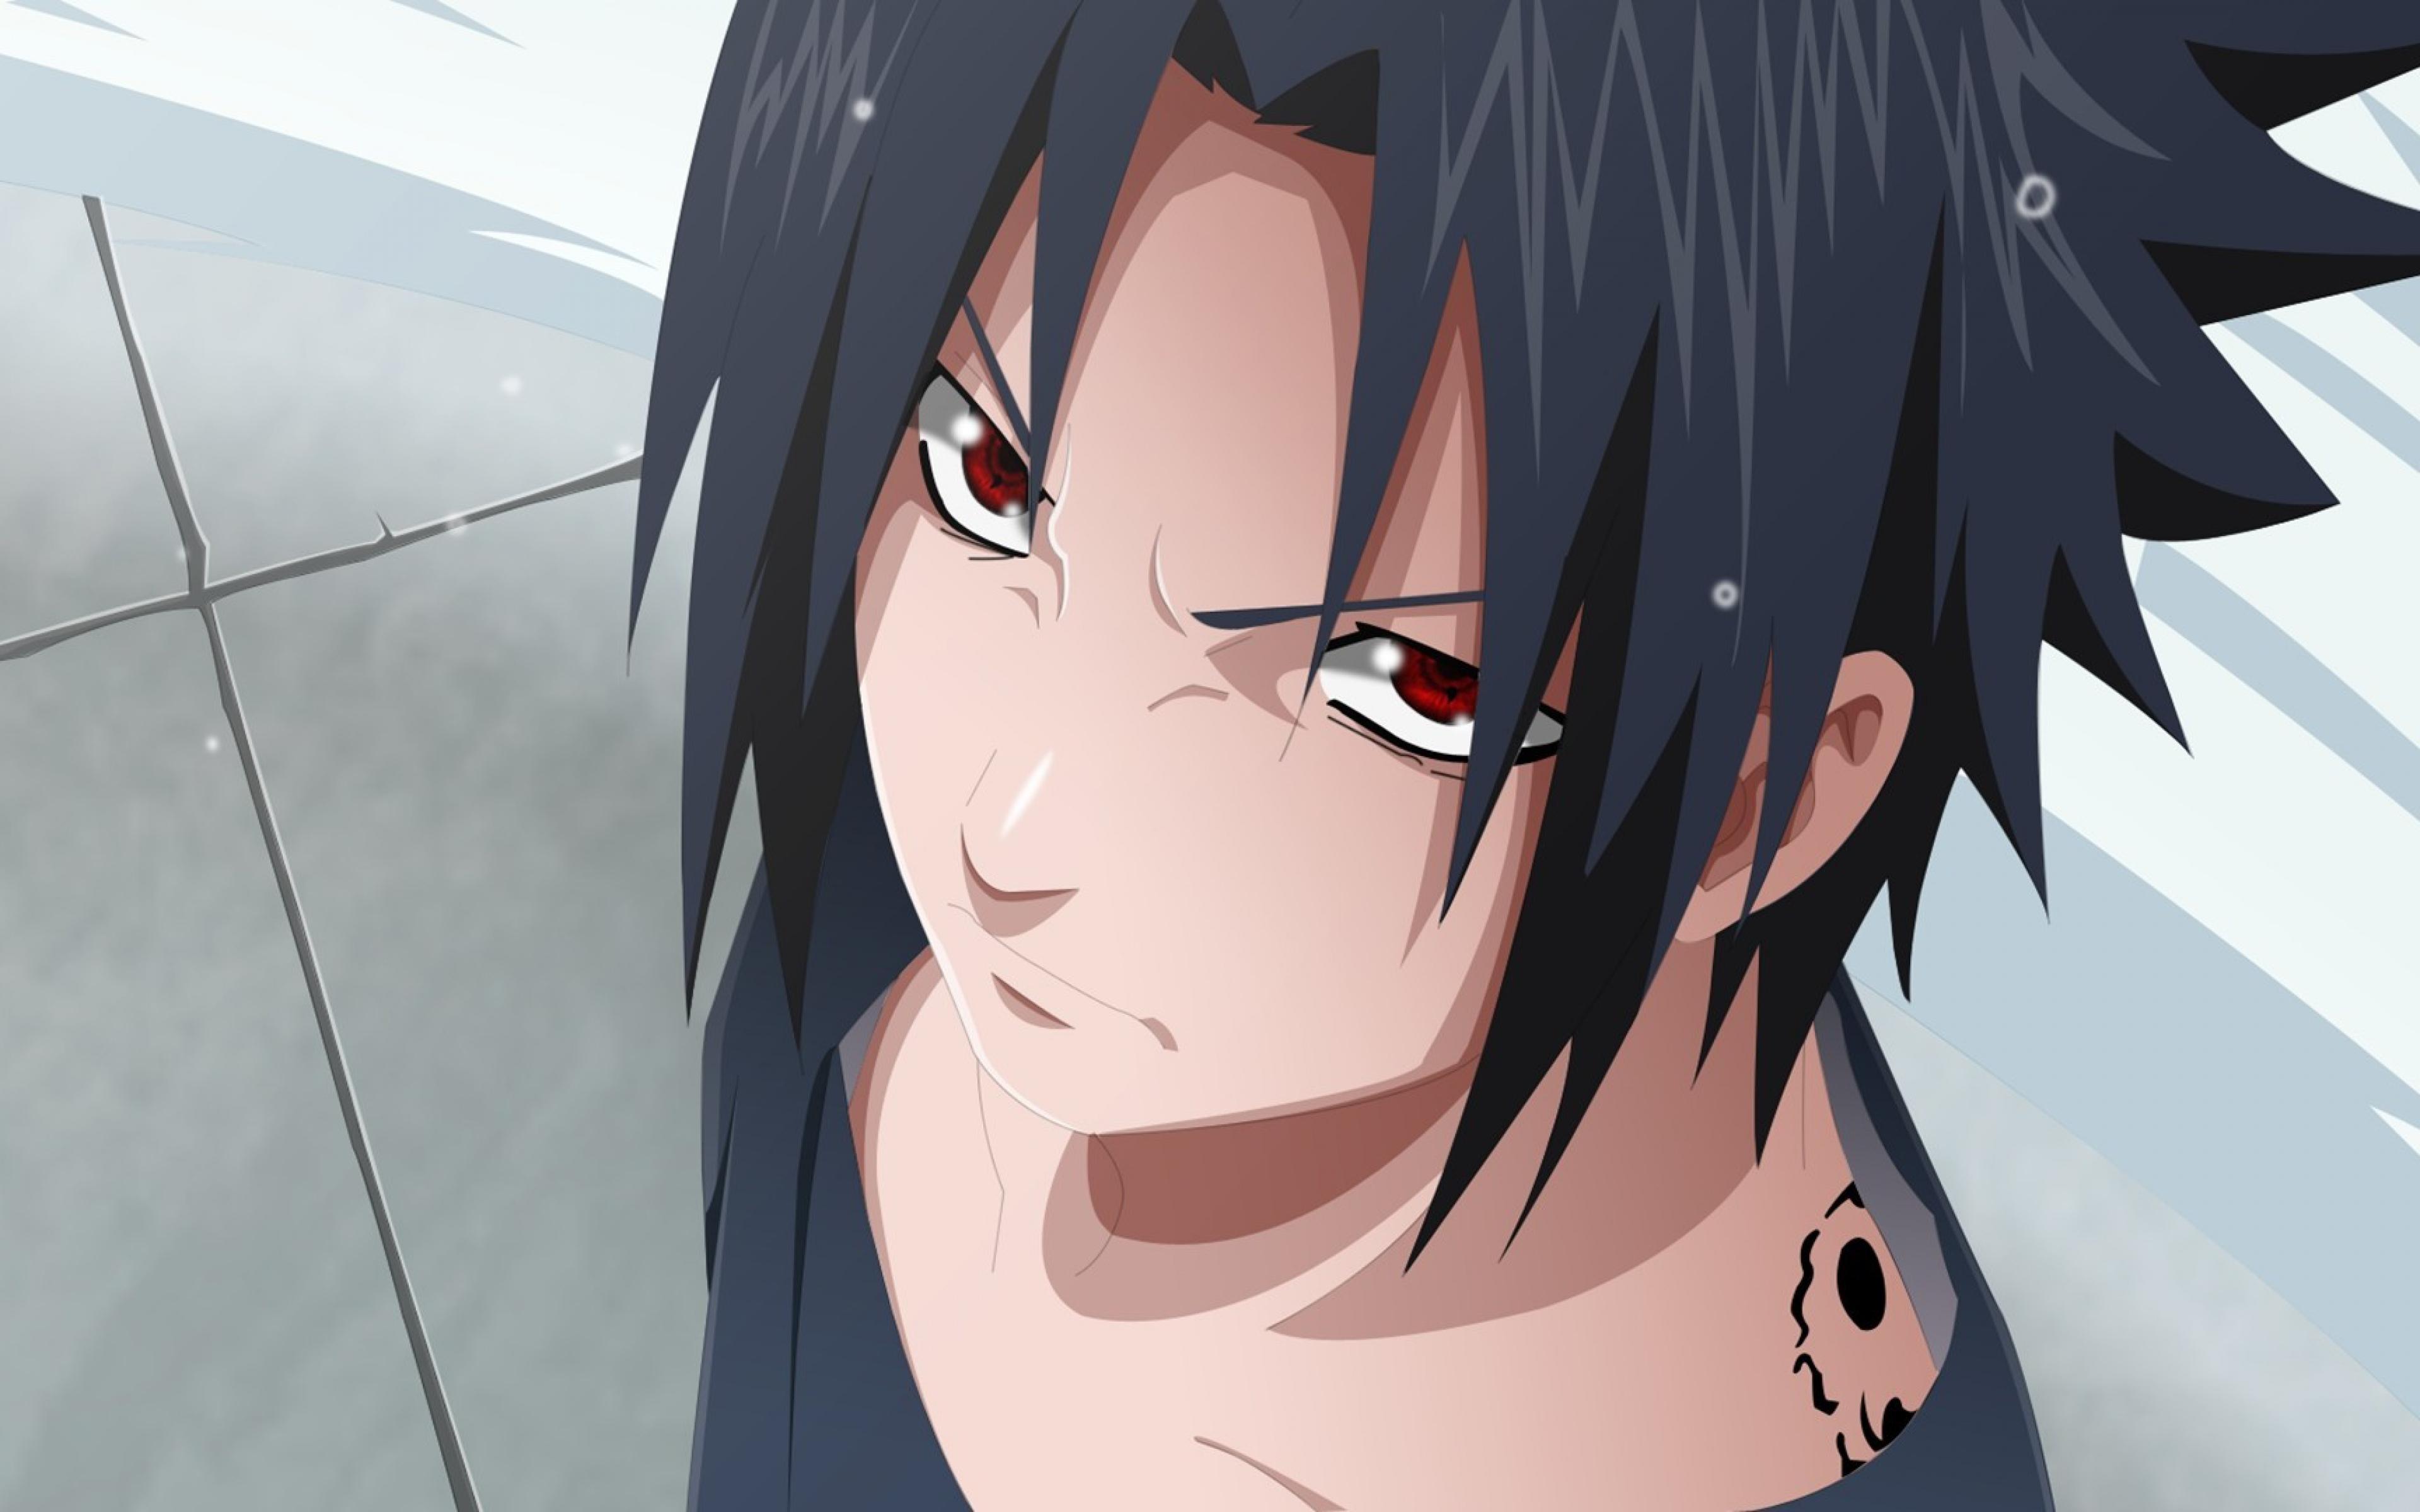 Sasuke Uchiha 4k Ultra Hd Wallpaper Background Image